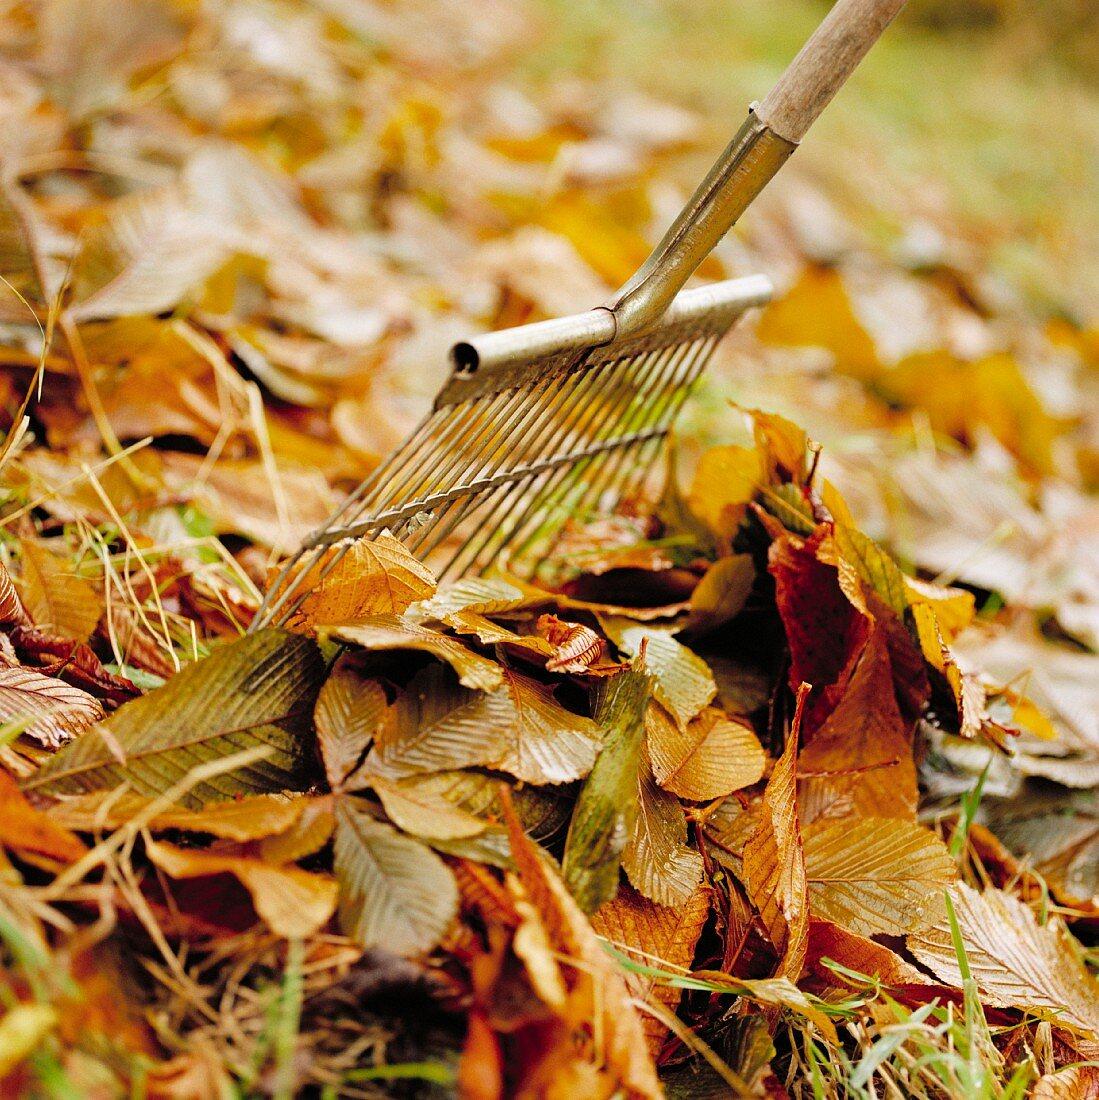 Raking up autumn leaves